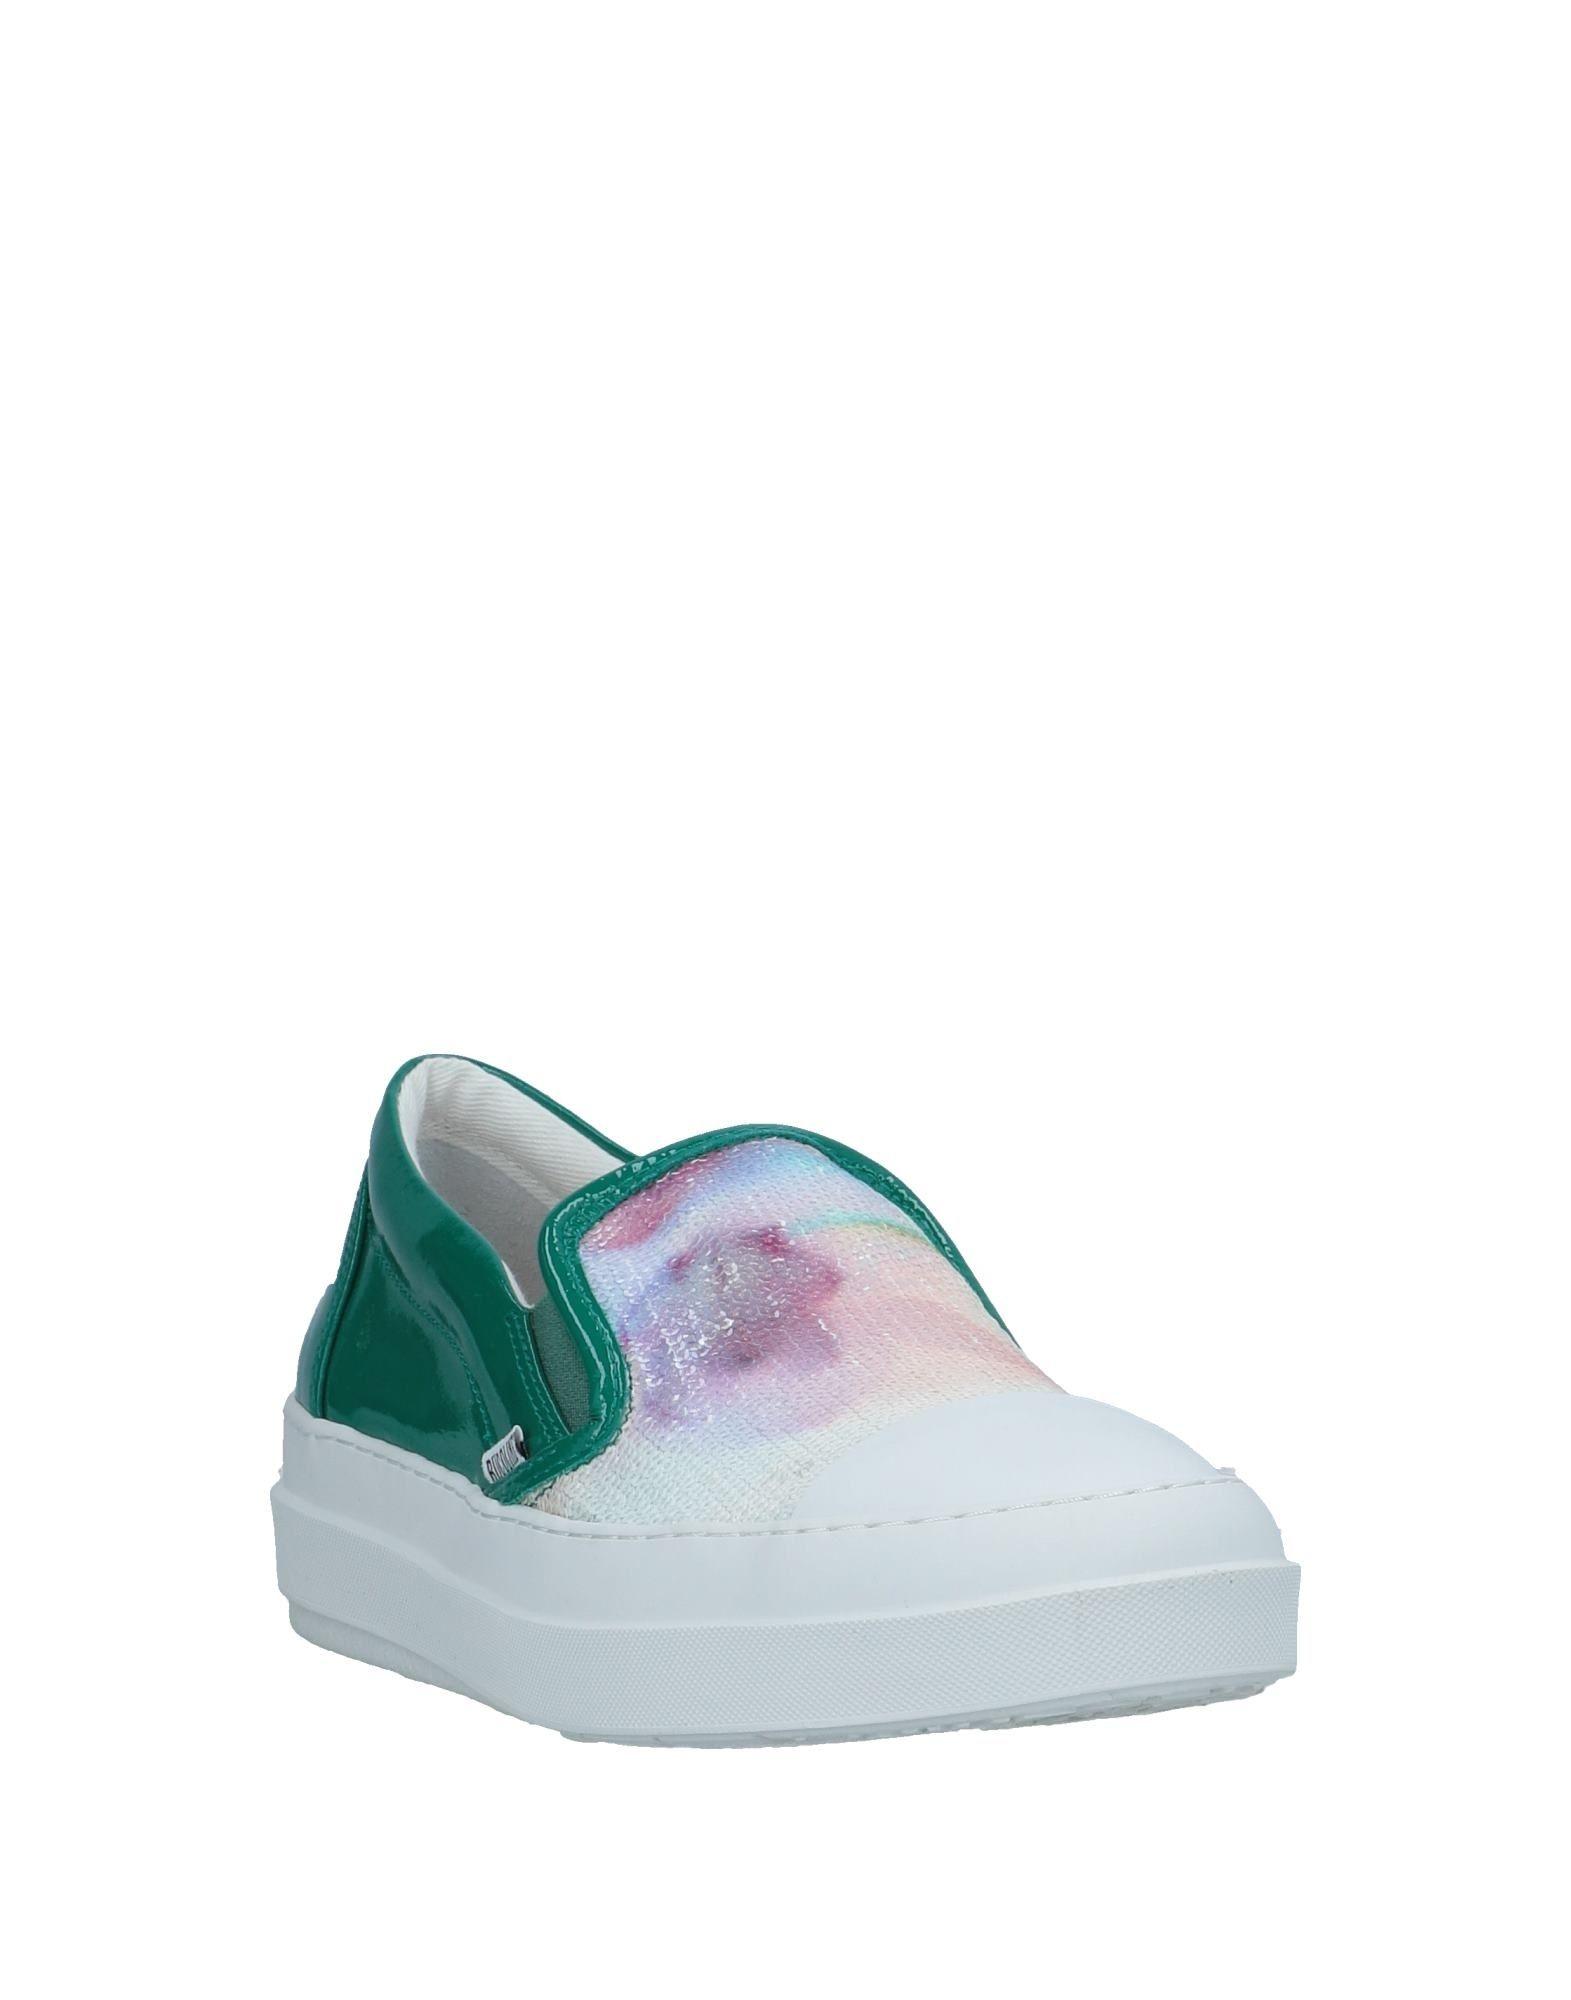 Ruco Line Sneakers Damen  11507007PH Gute Qualität beliebte Schuhe